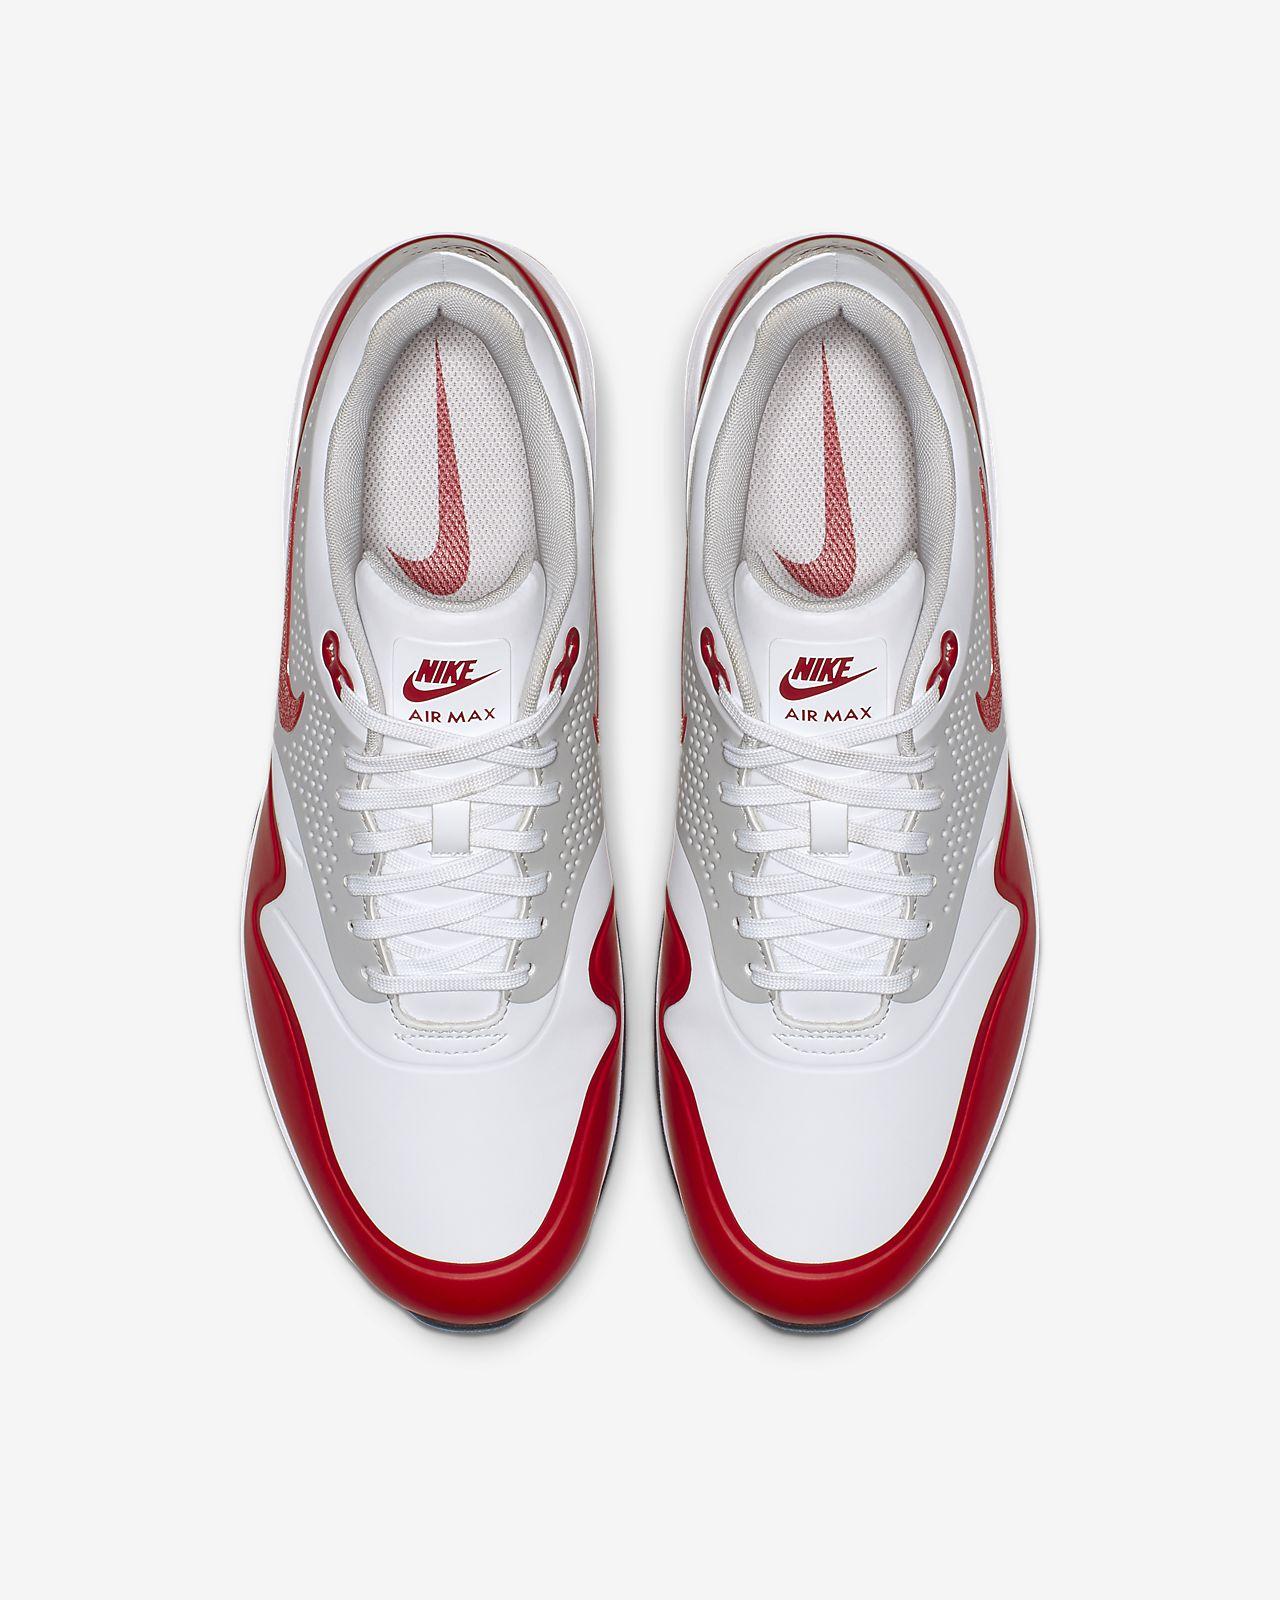 promo code bac0c 73e48 ... Nike Air Max 1 G Men s Golf Shoe